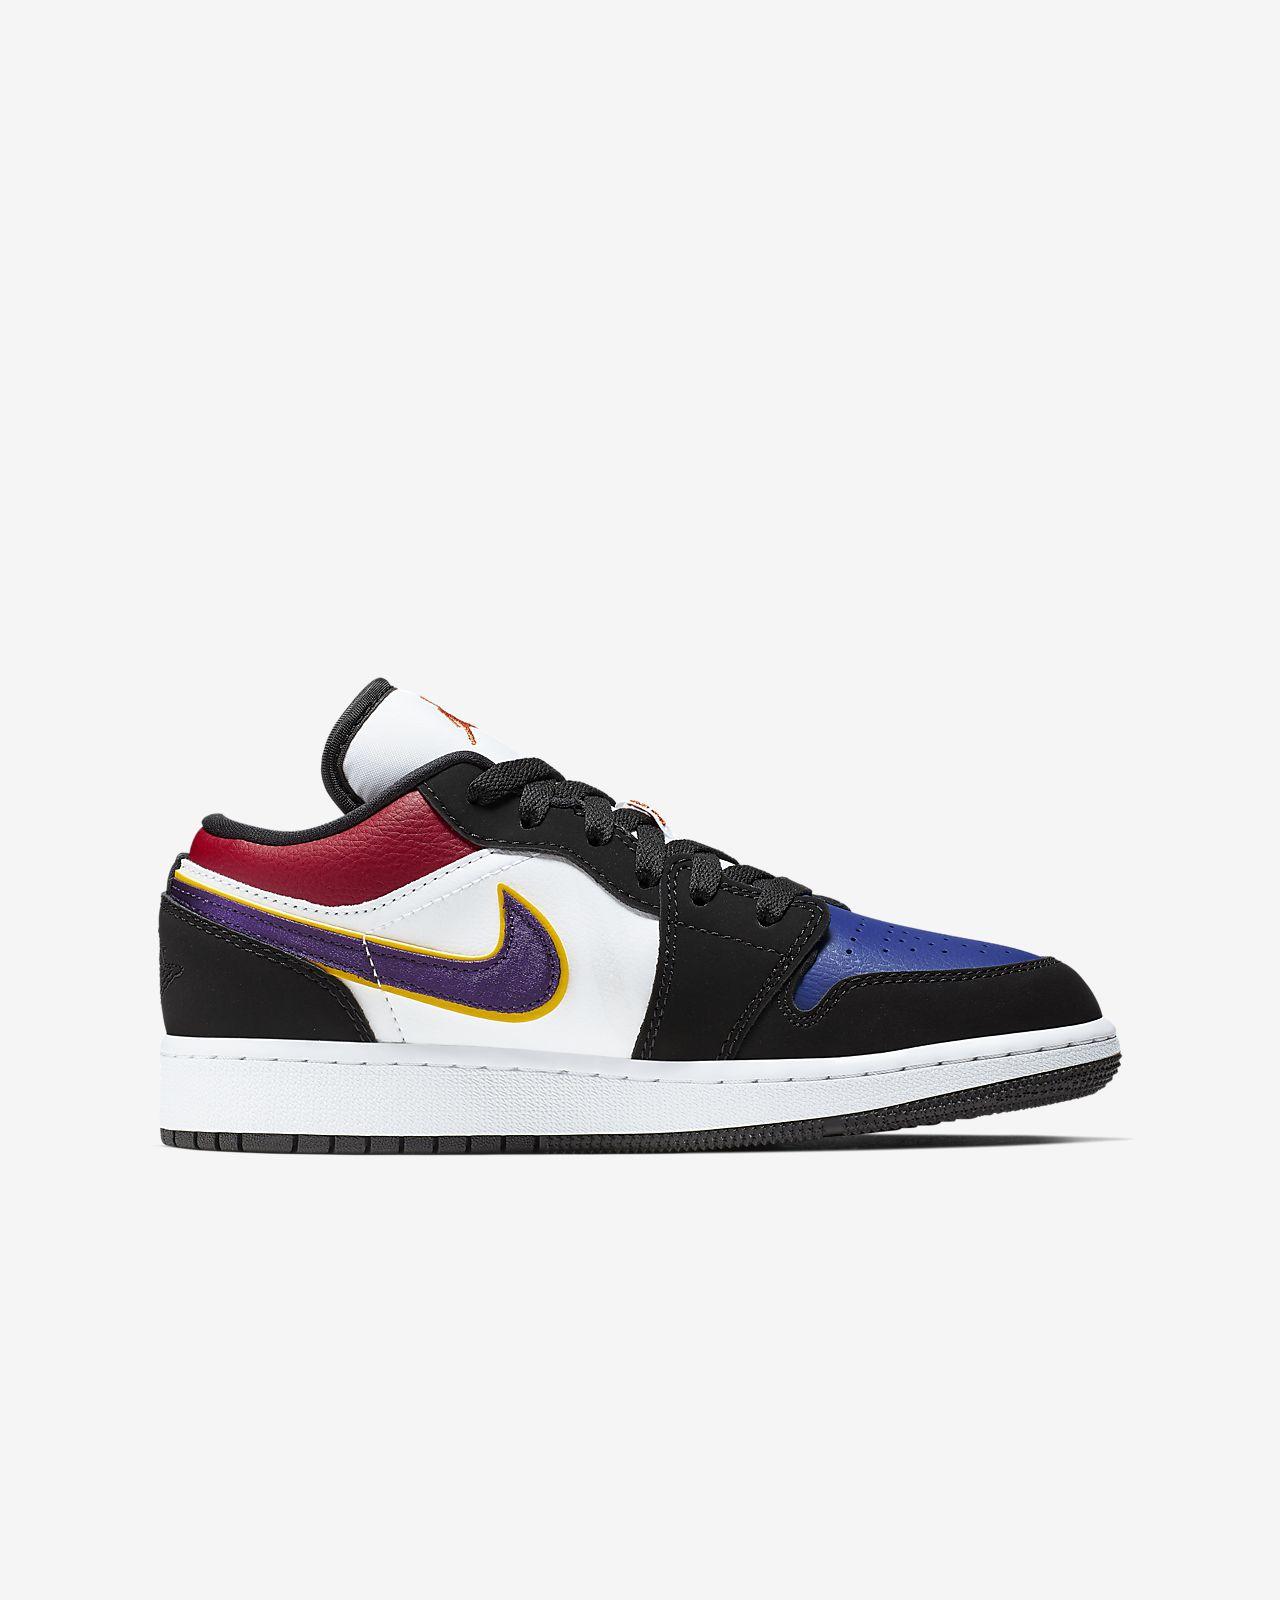 quality design 07db0 813ca Air Jordan 1 Low Big Kids' Shoe